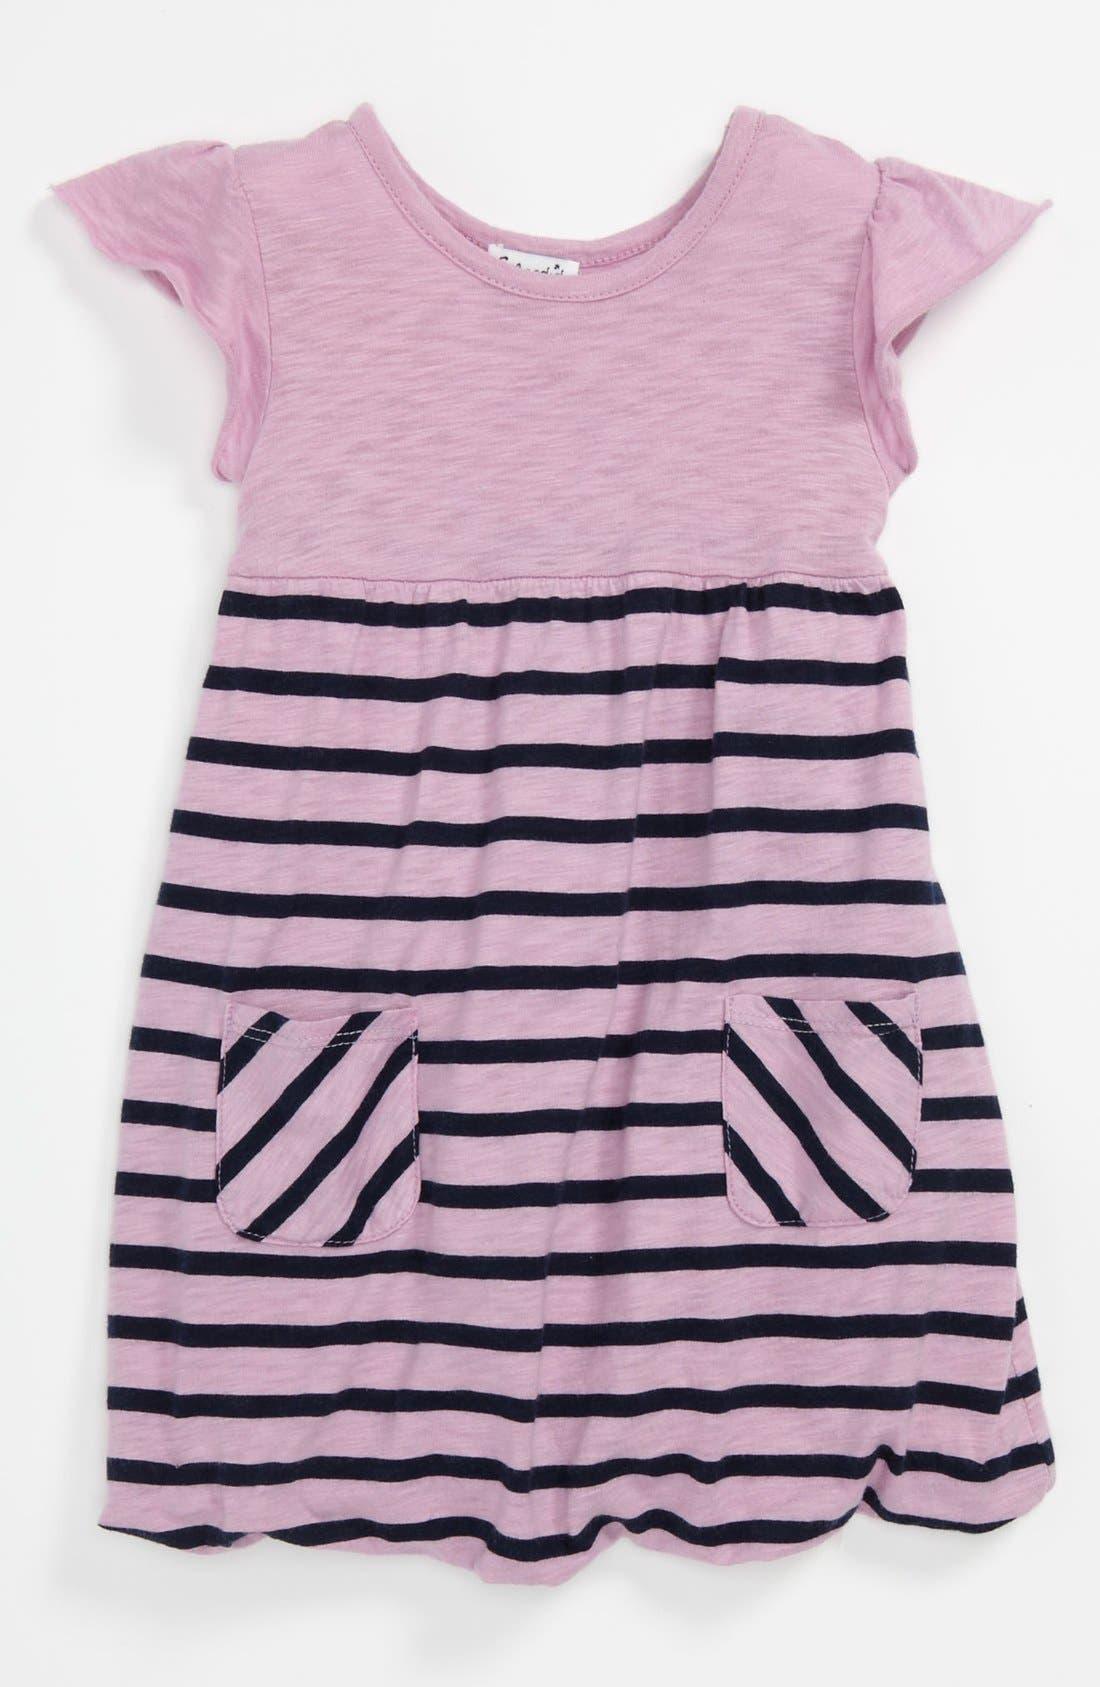 Main Image - Splendid 'Miami' Stripe Dress (Baby)